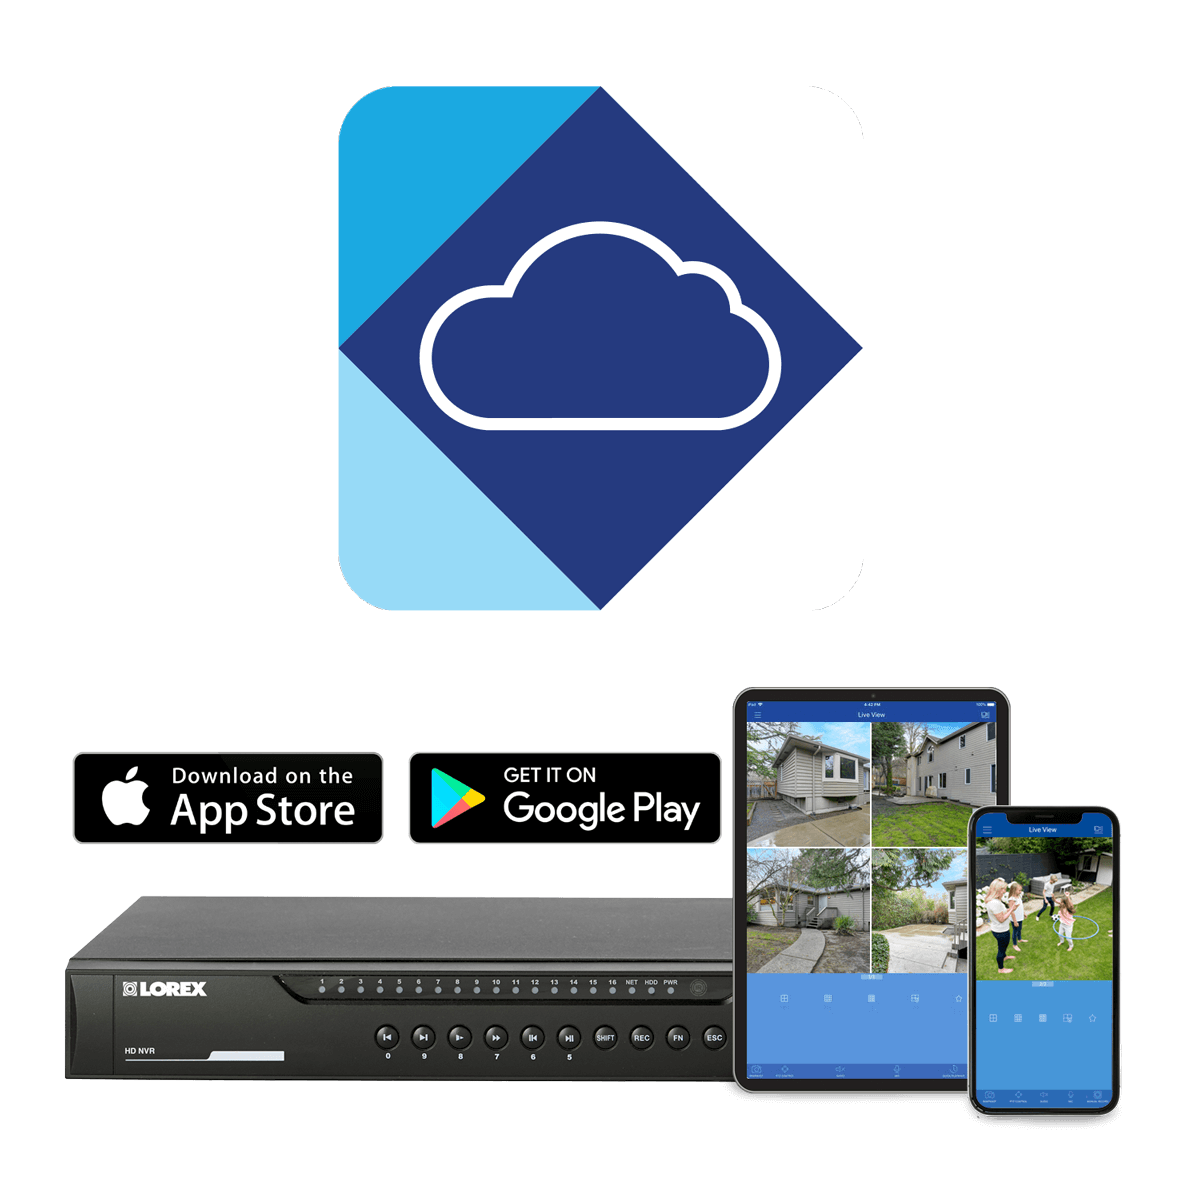 Lorex Cloud Remote Viewing